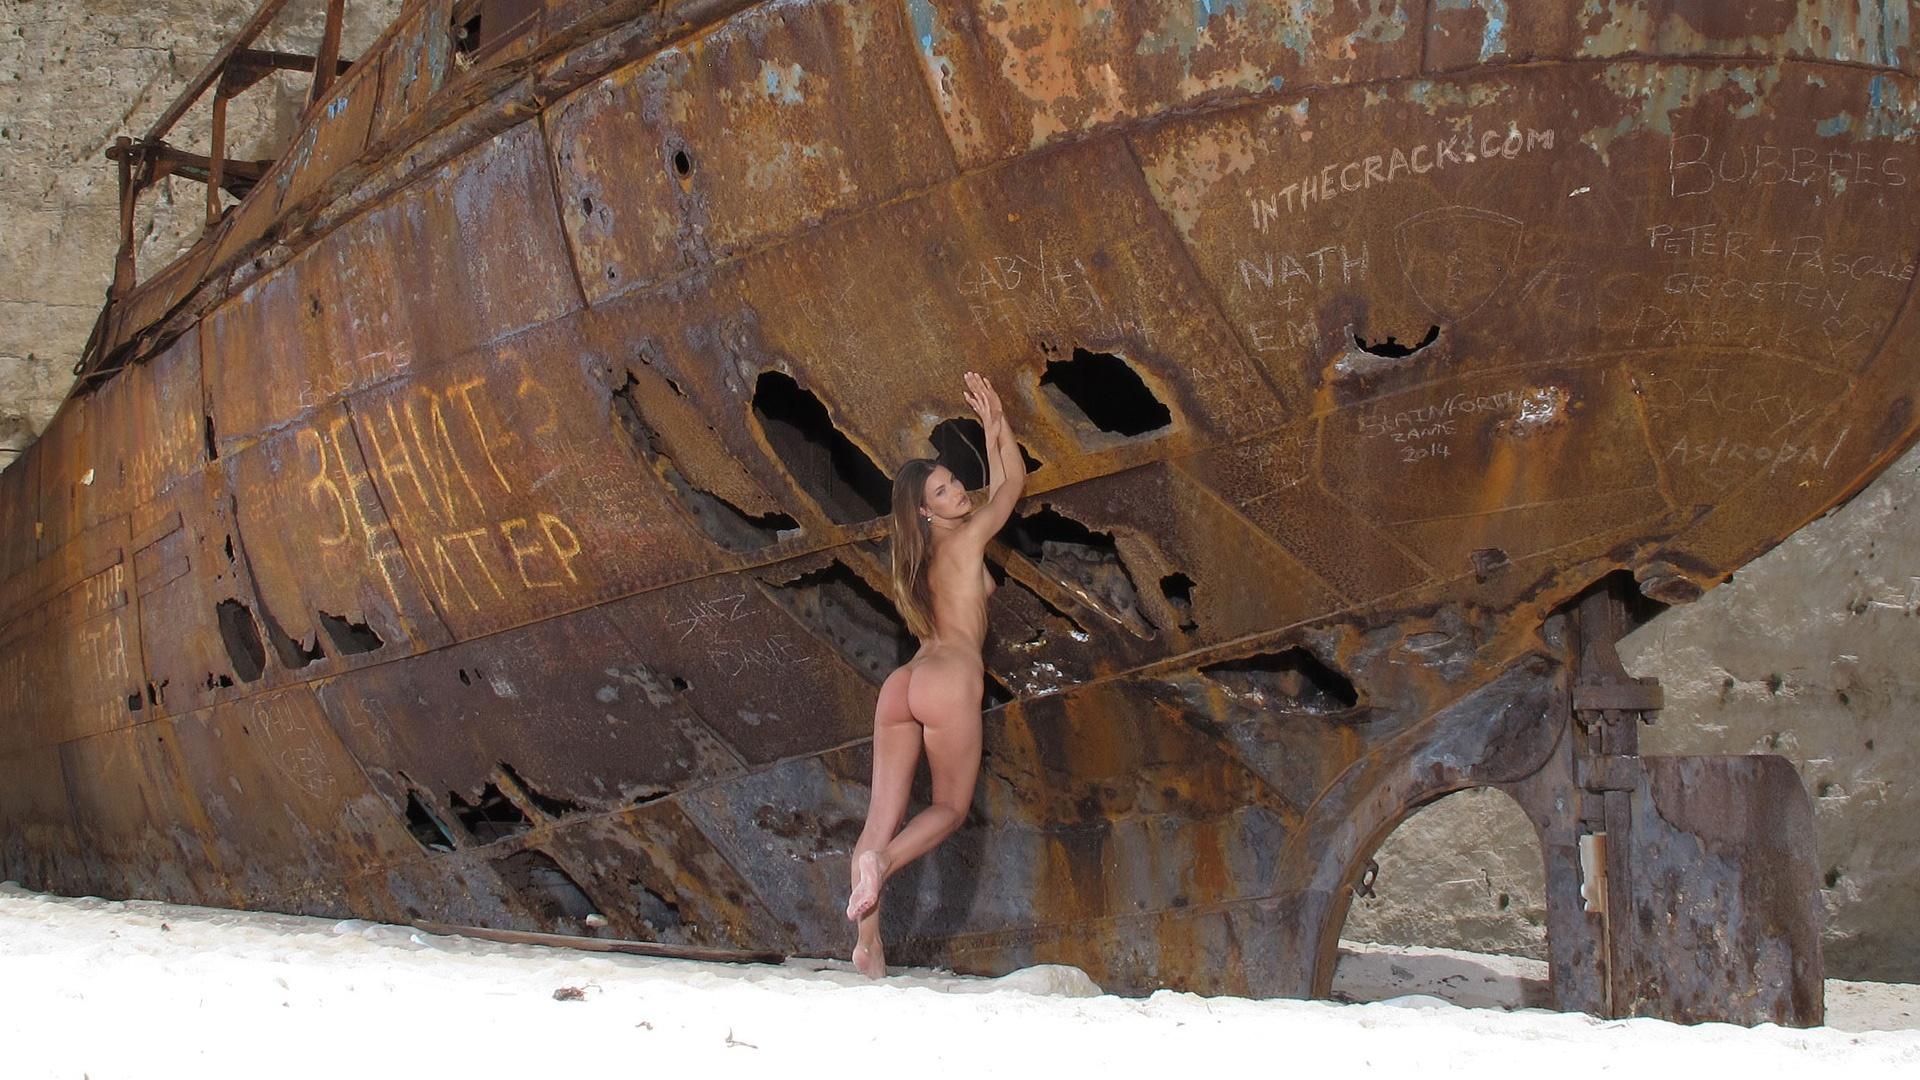 Irvin recommends Mature nude women panties